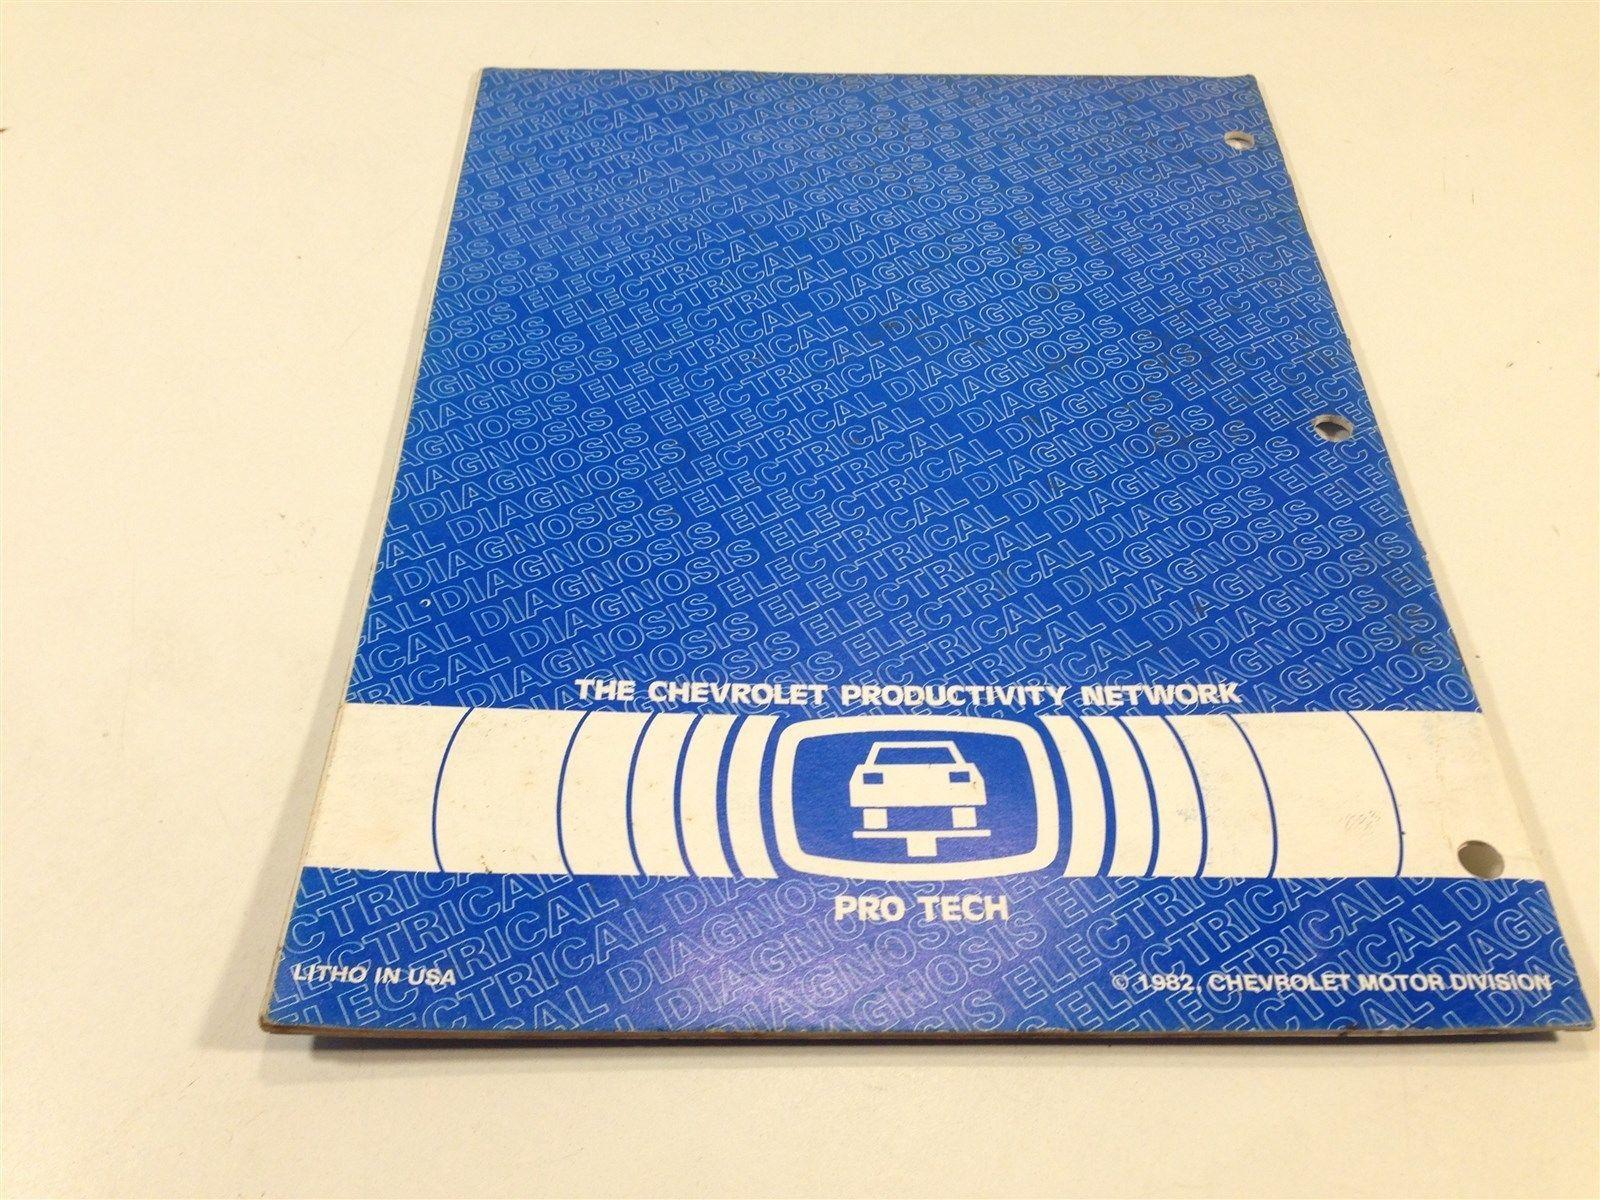 1982 Chevrolet Pro Tech Electrical Diagnosis Service Procedures Blue Book